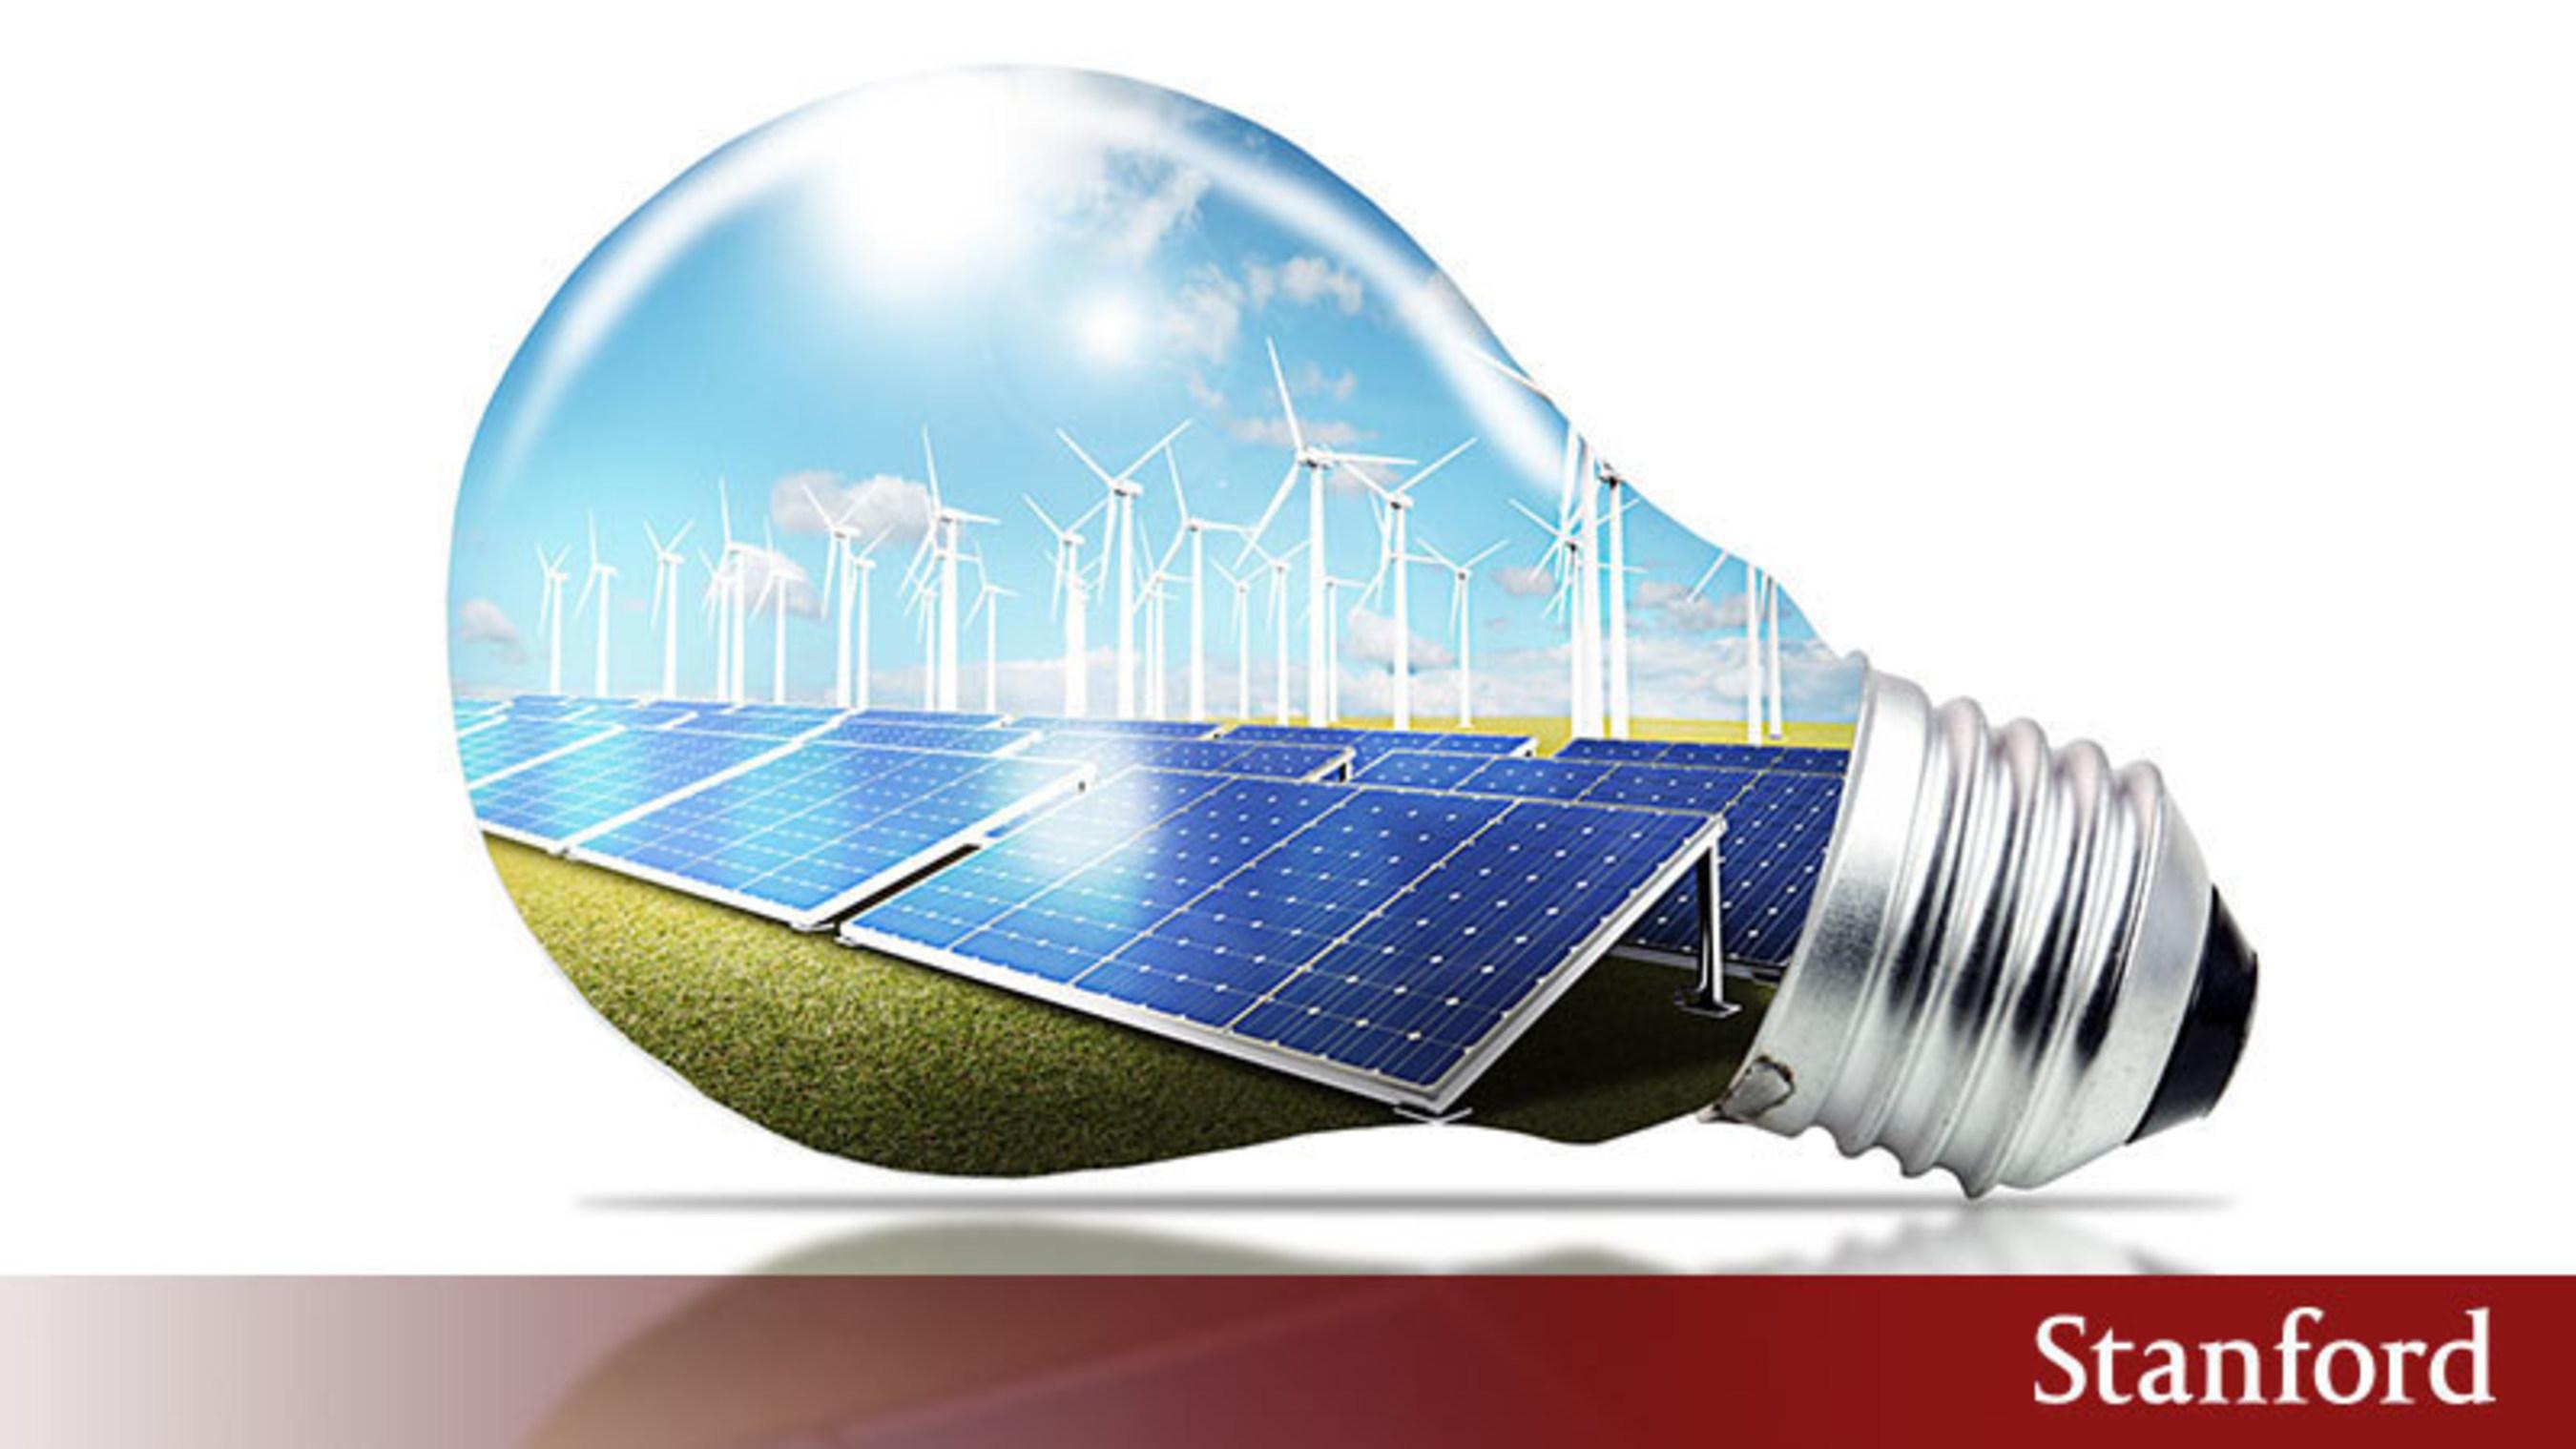 Stanford Energy Innovation and Emerging Technologies Program Image